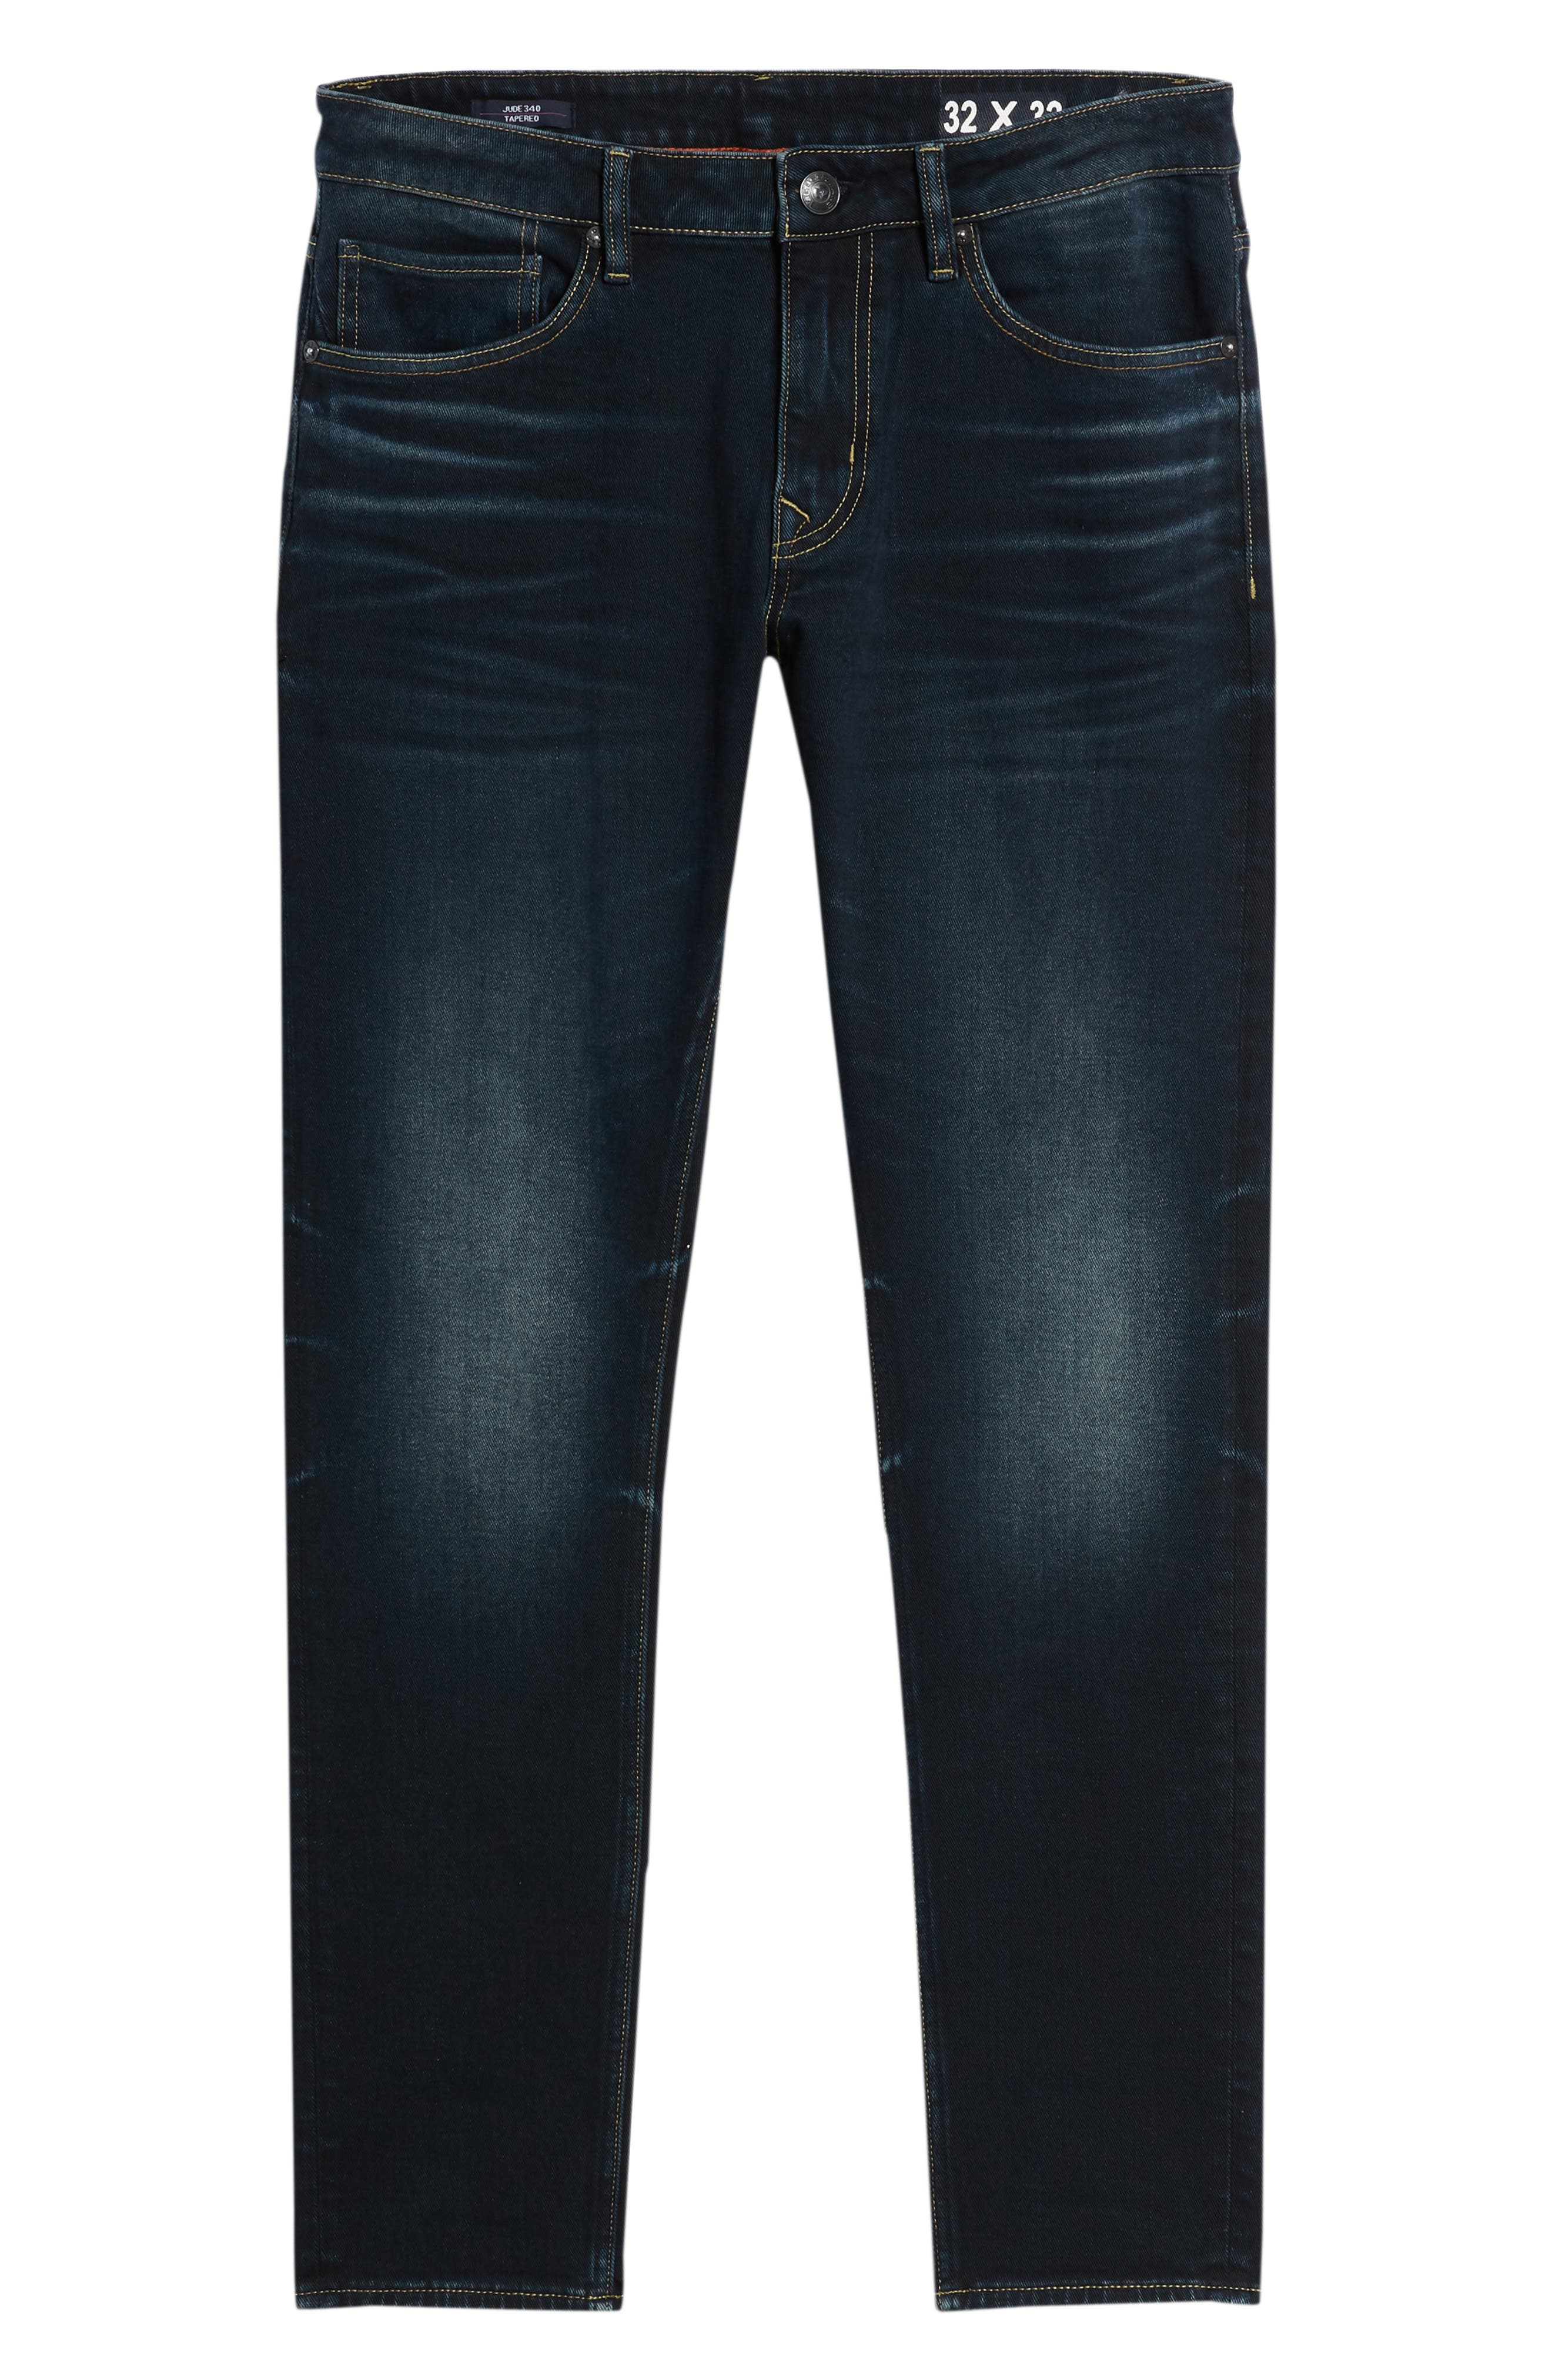 Jude Slim Fit Jeans,                             Alternate thumbnail 6, color,                             DARK 3D WASH